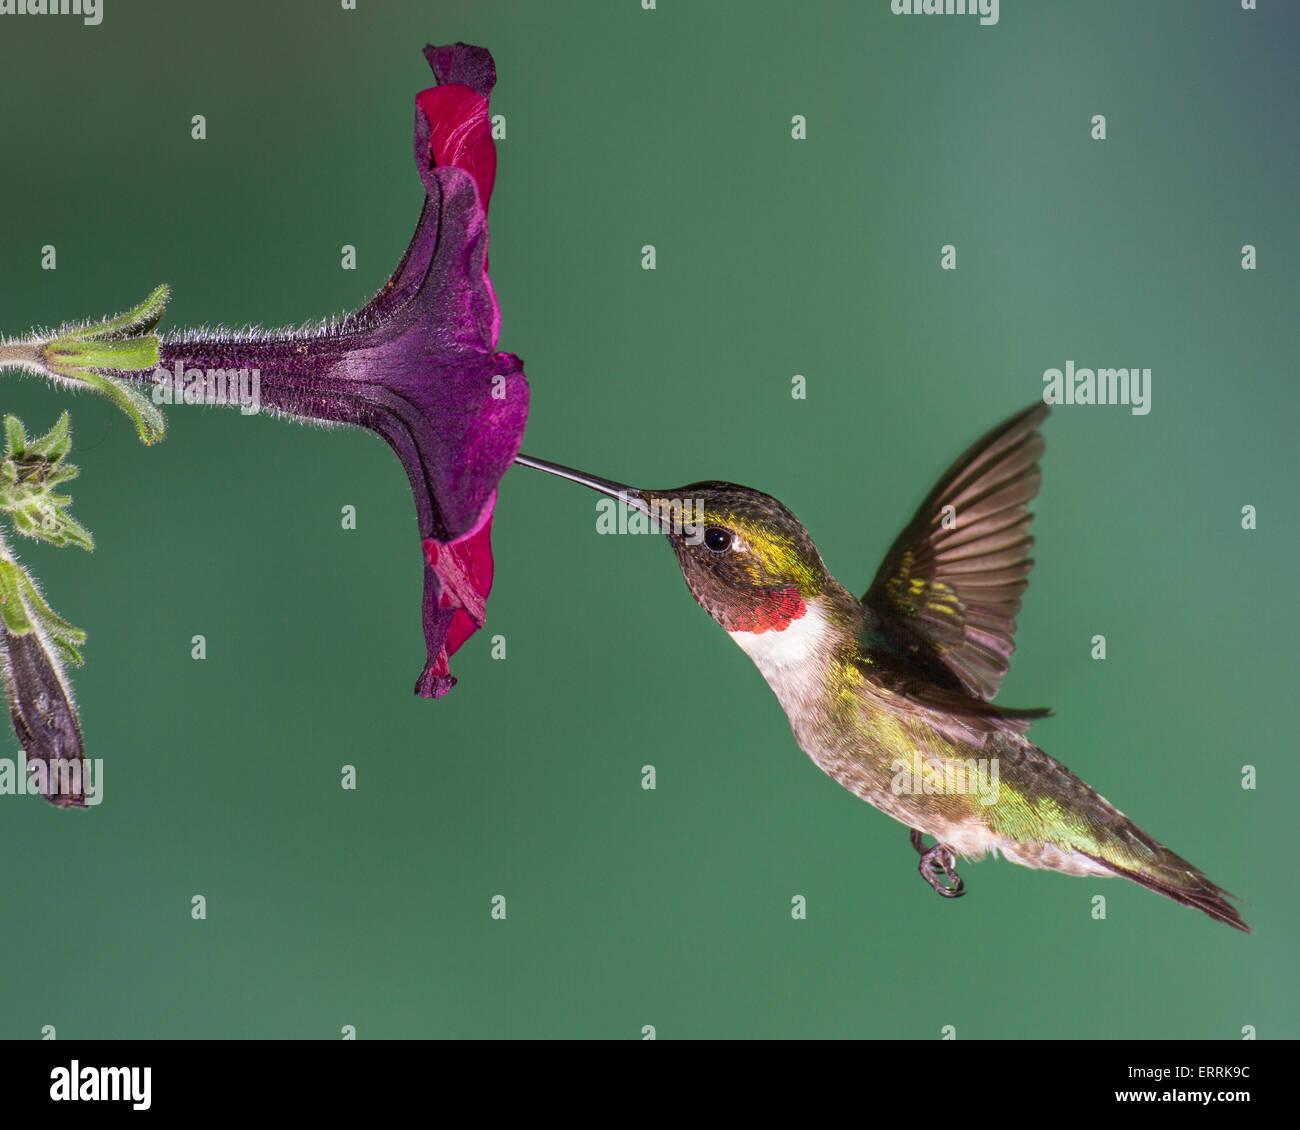 Rubí-throated hummingbird recogiendo néctar de una petunia. Imagen De Stock